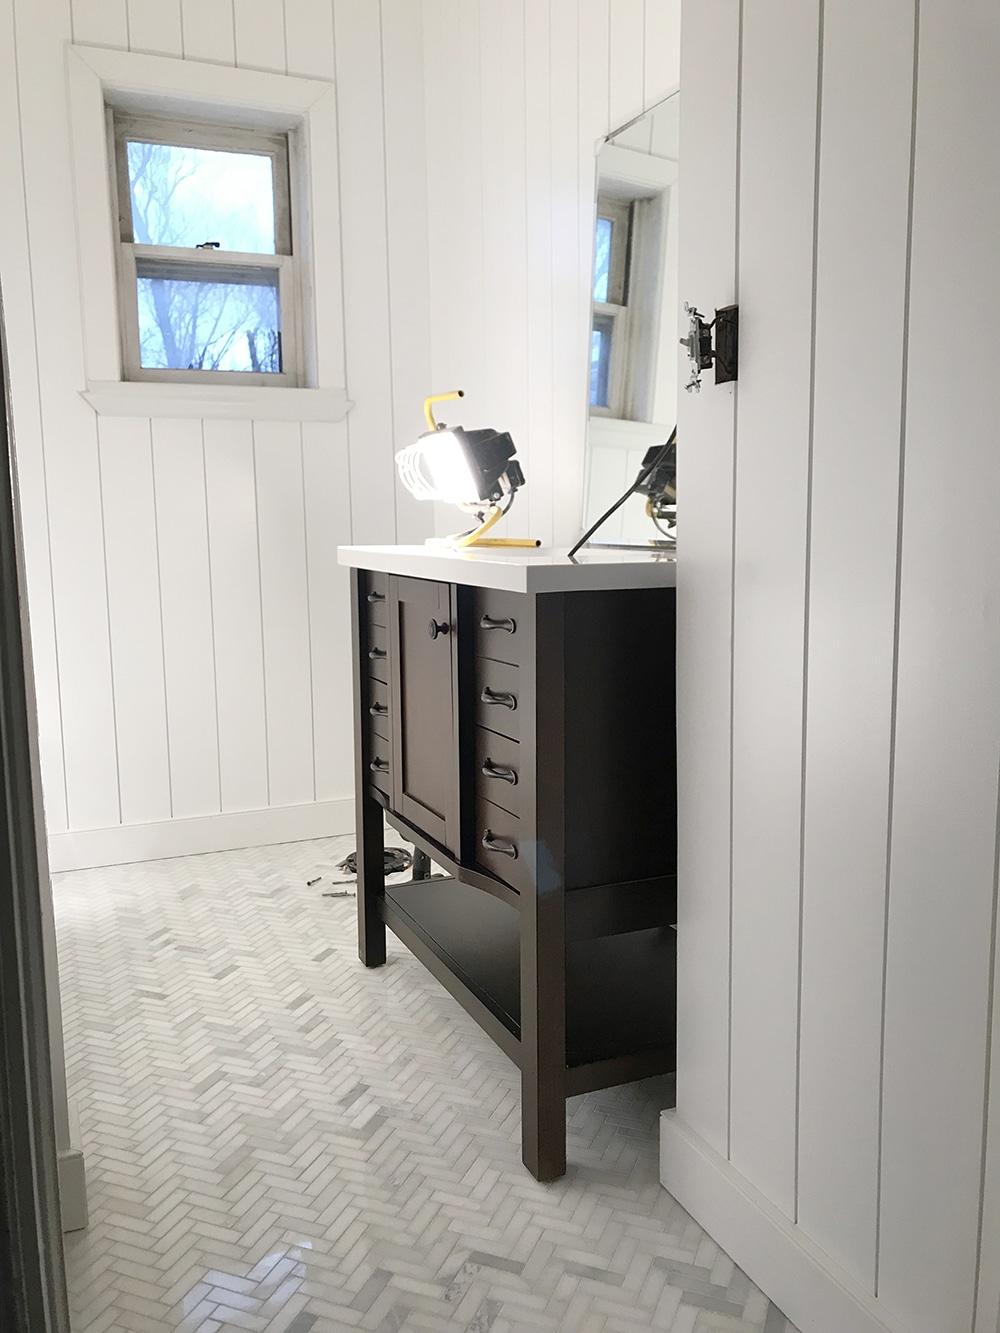 Installing Pre Painted Vertical Shiplap In The Bathroom